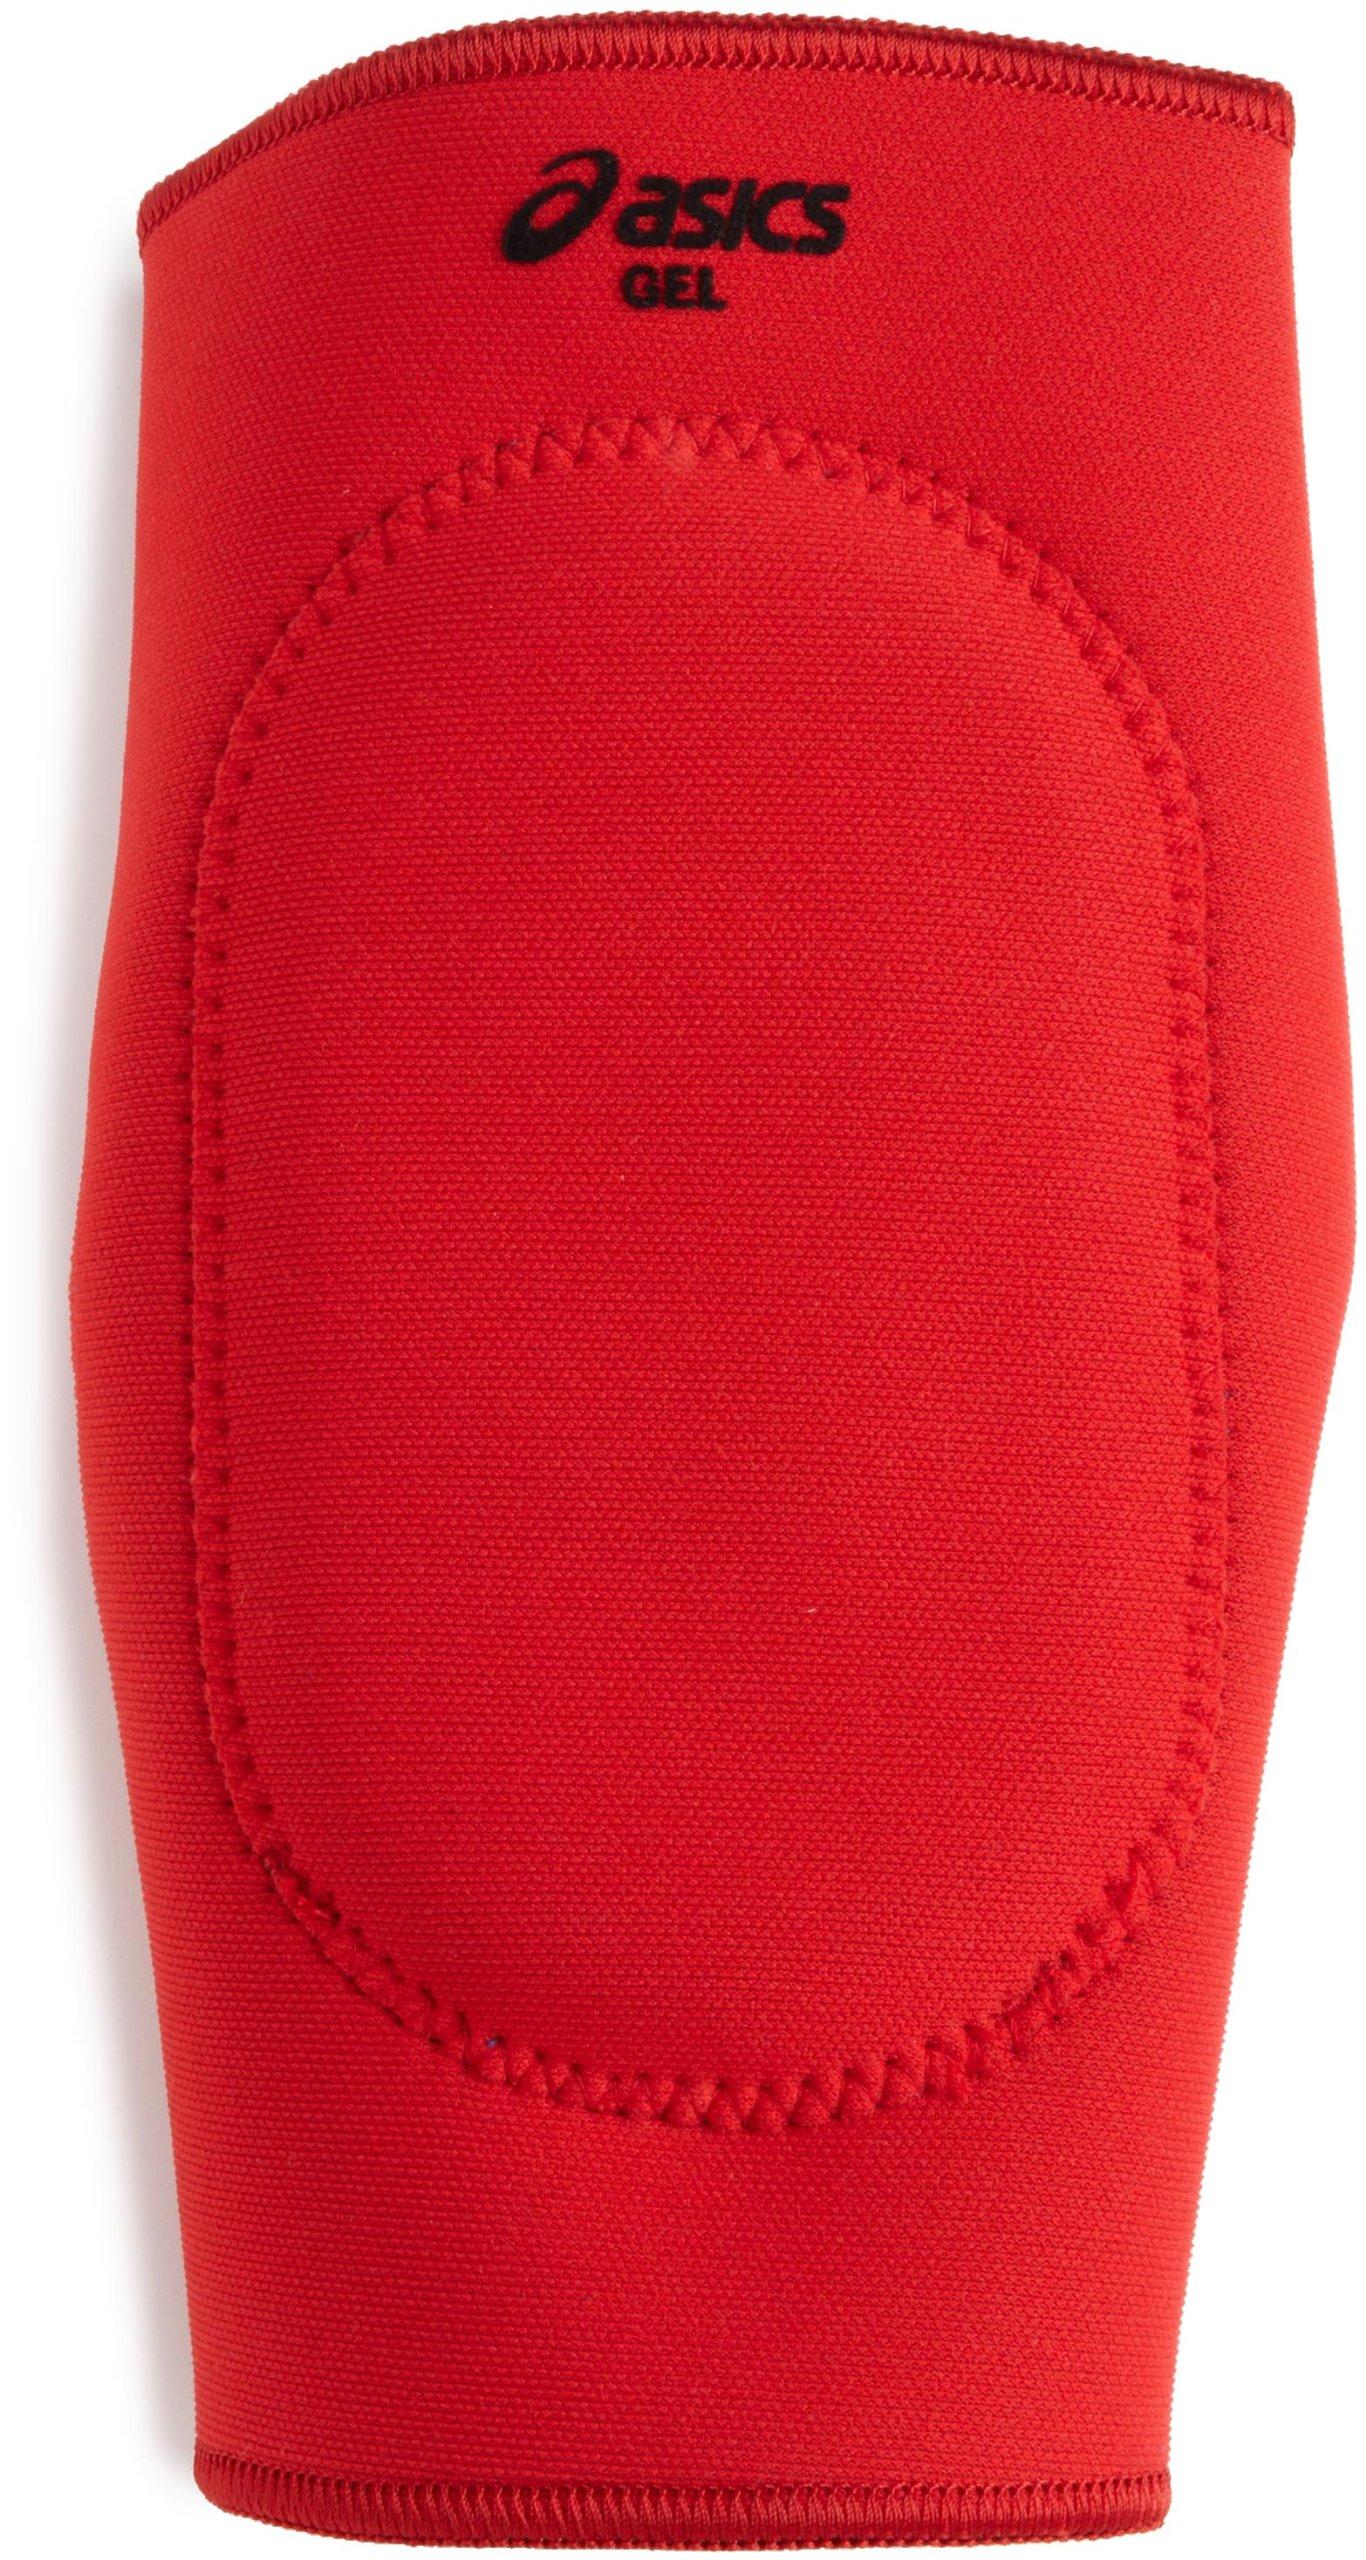 ASICS Gel Reversible, Red/Royal, Small